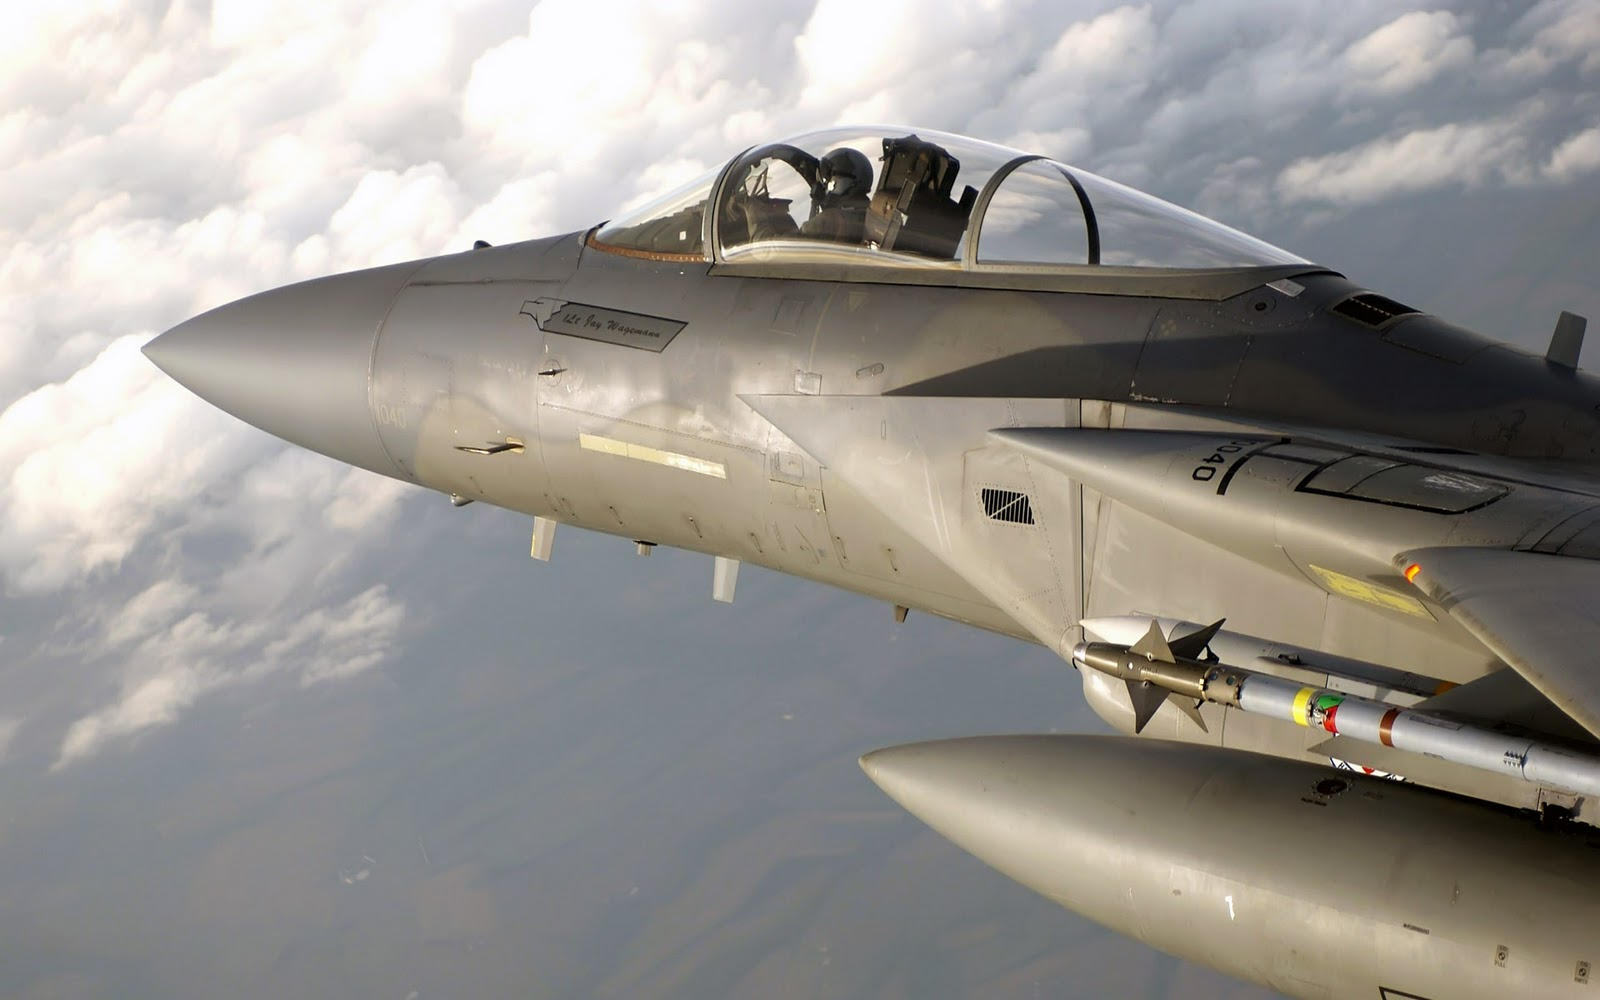 http://4.bp.blogspot.com/-Ua9cxQPzoVk/TybDKqMeXBI/AAAAAAAAAaI/g-TinnTvxfU/s1600/warplane+wallpaper++(3).jpg